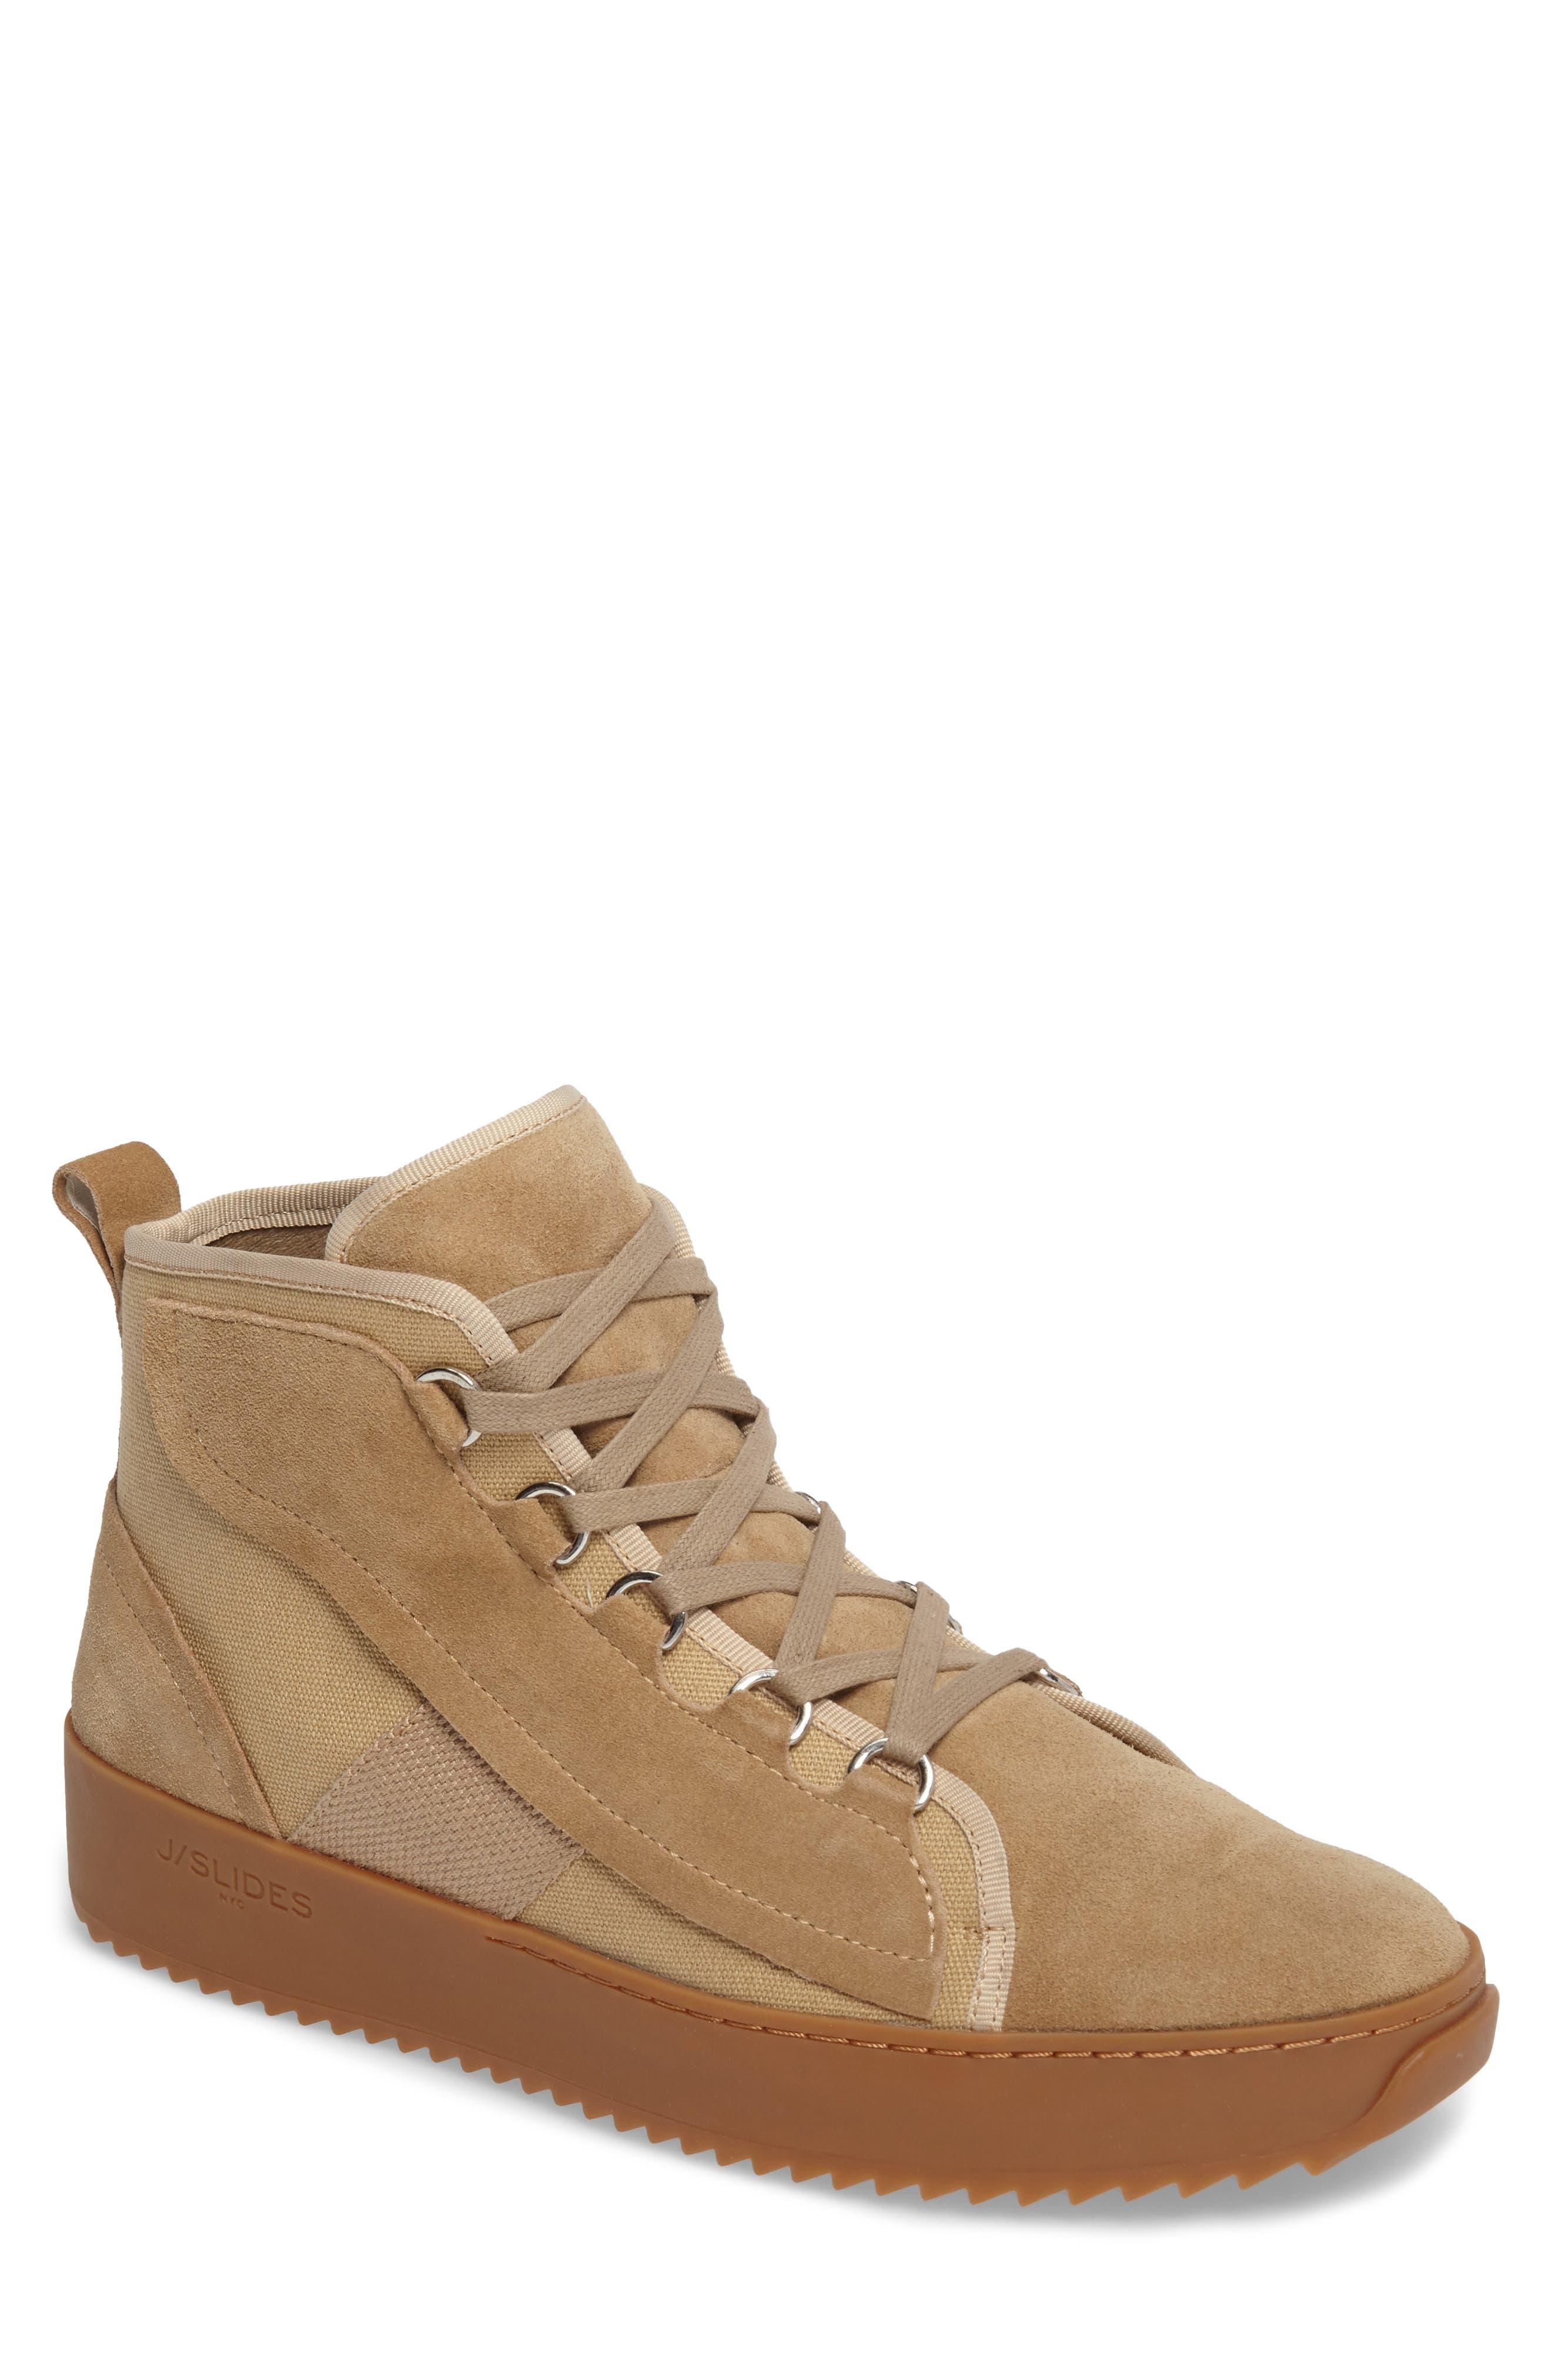 Sander Sneaker,                         Main,                         color, Sand Suede